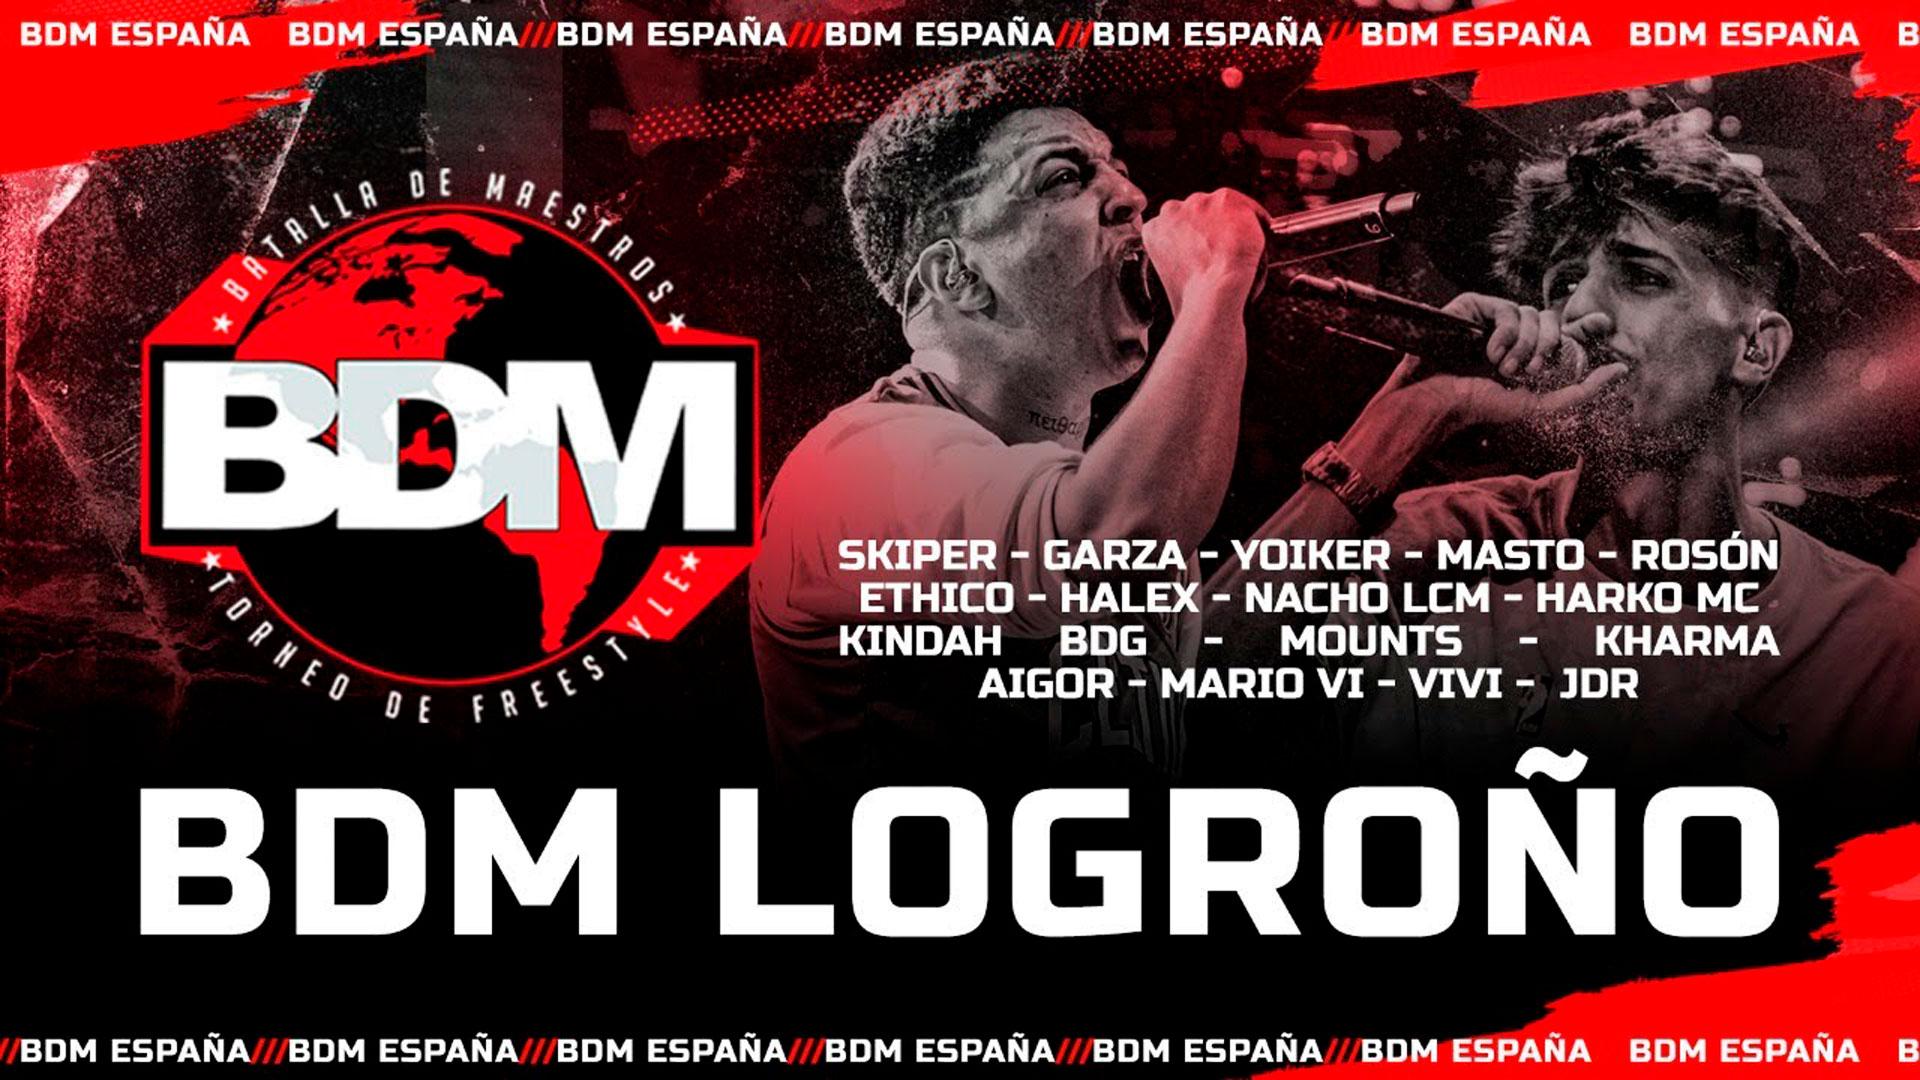 BDM Logroño